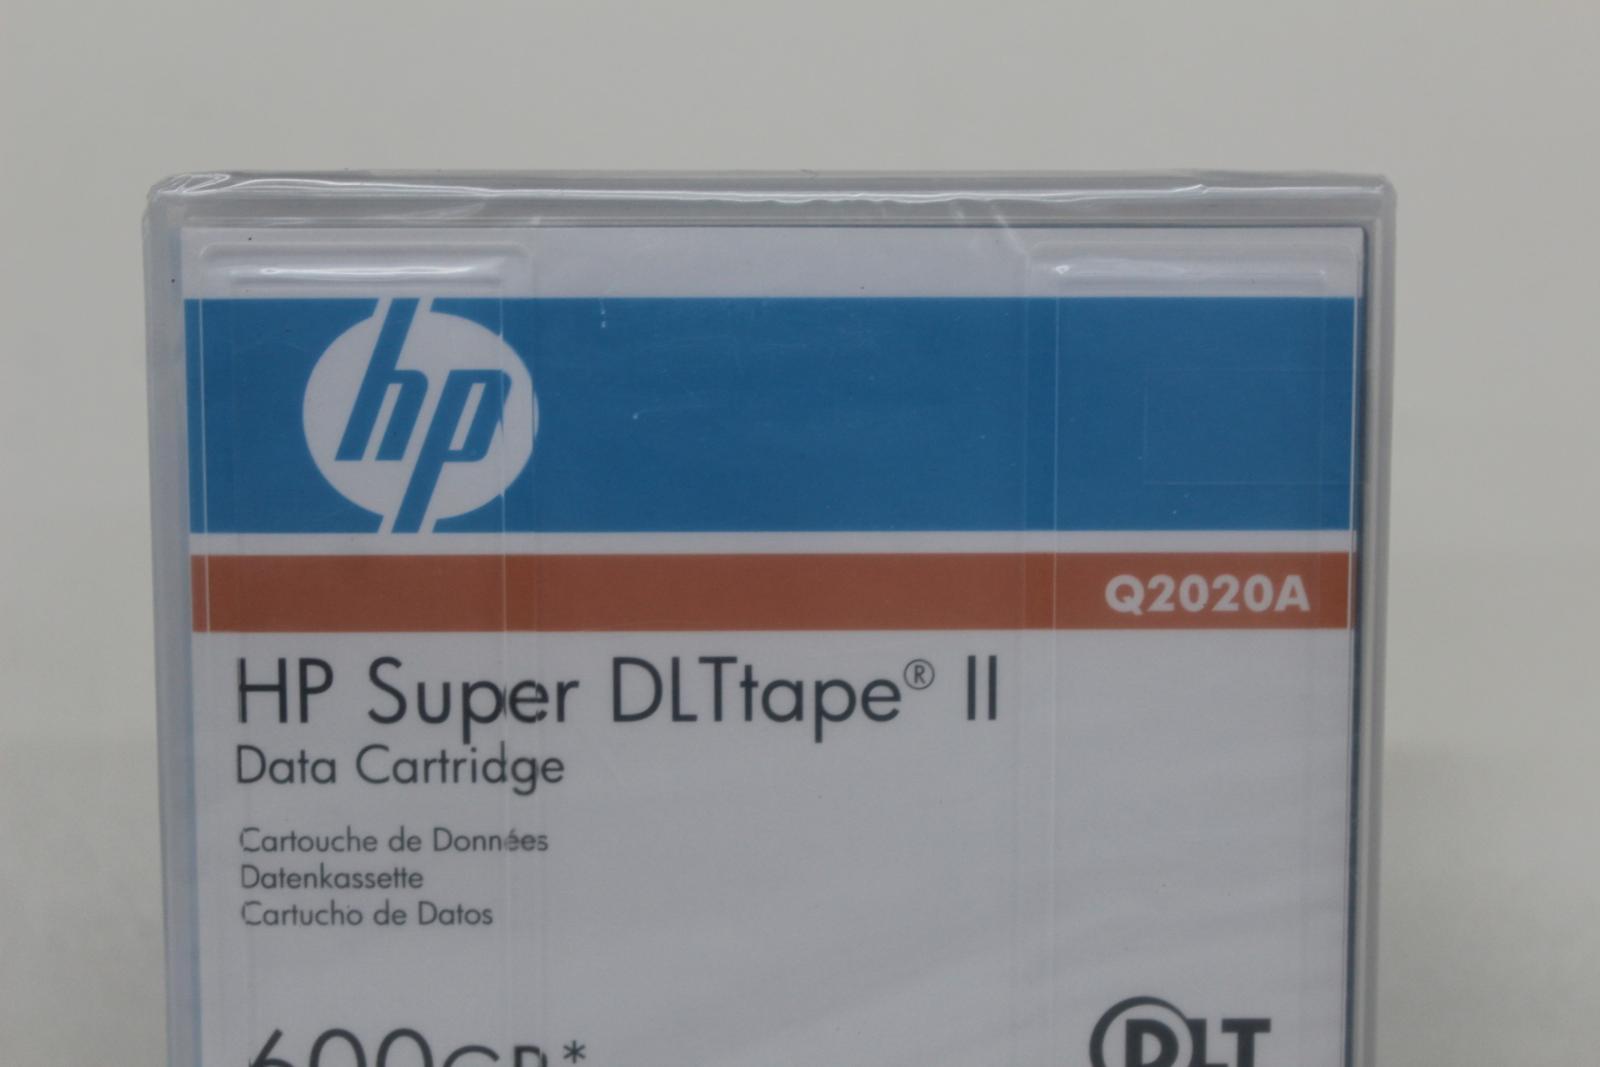 HP-Q2020A-Super-DLtape-II-Data-Tape-Square-cartouche-600-Go-job-lot-4x-NEUF miniature 5